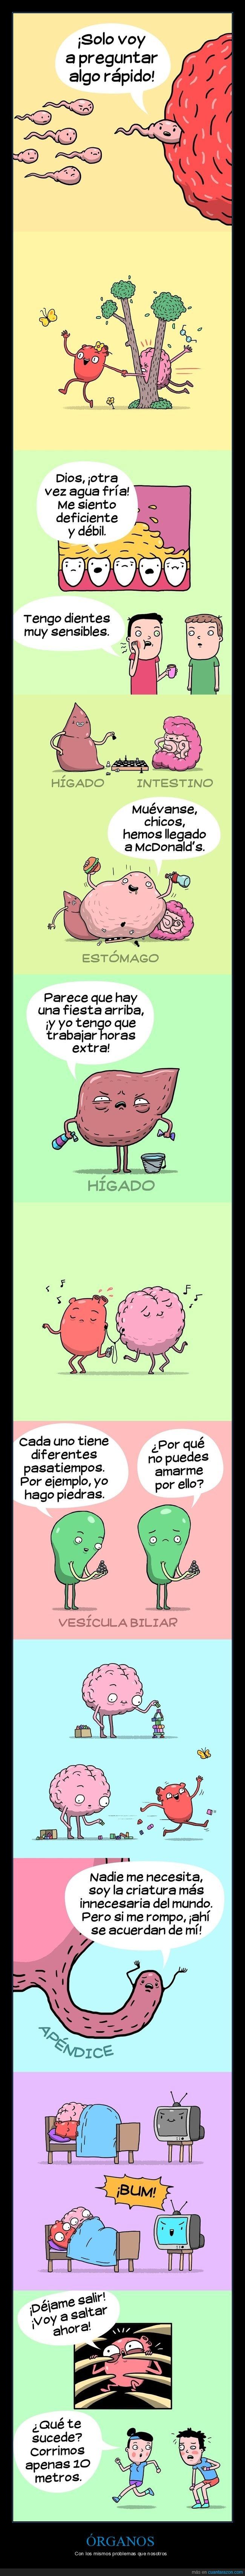 cómics,órganos,problemas